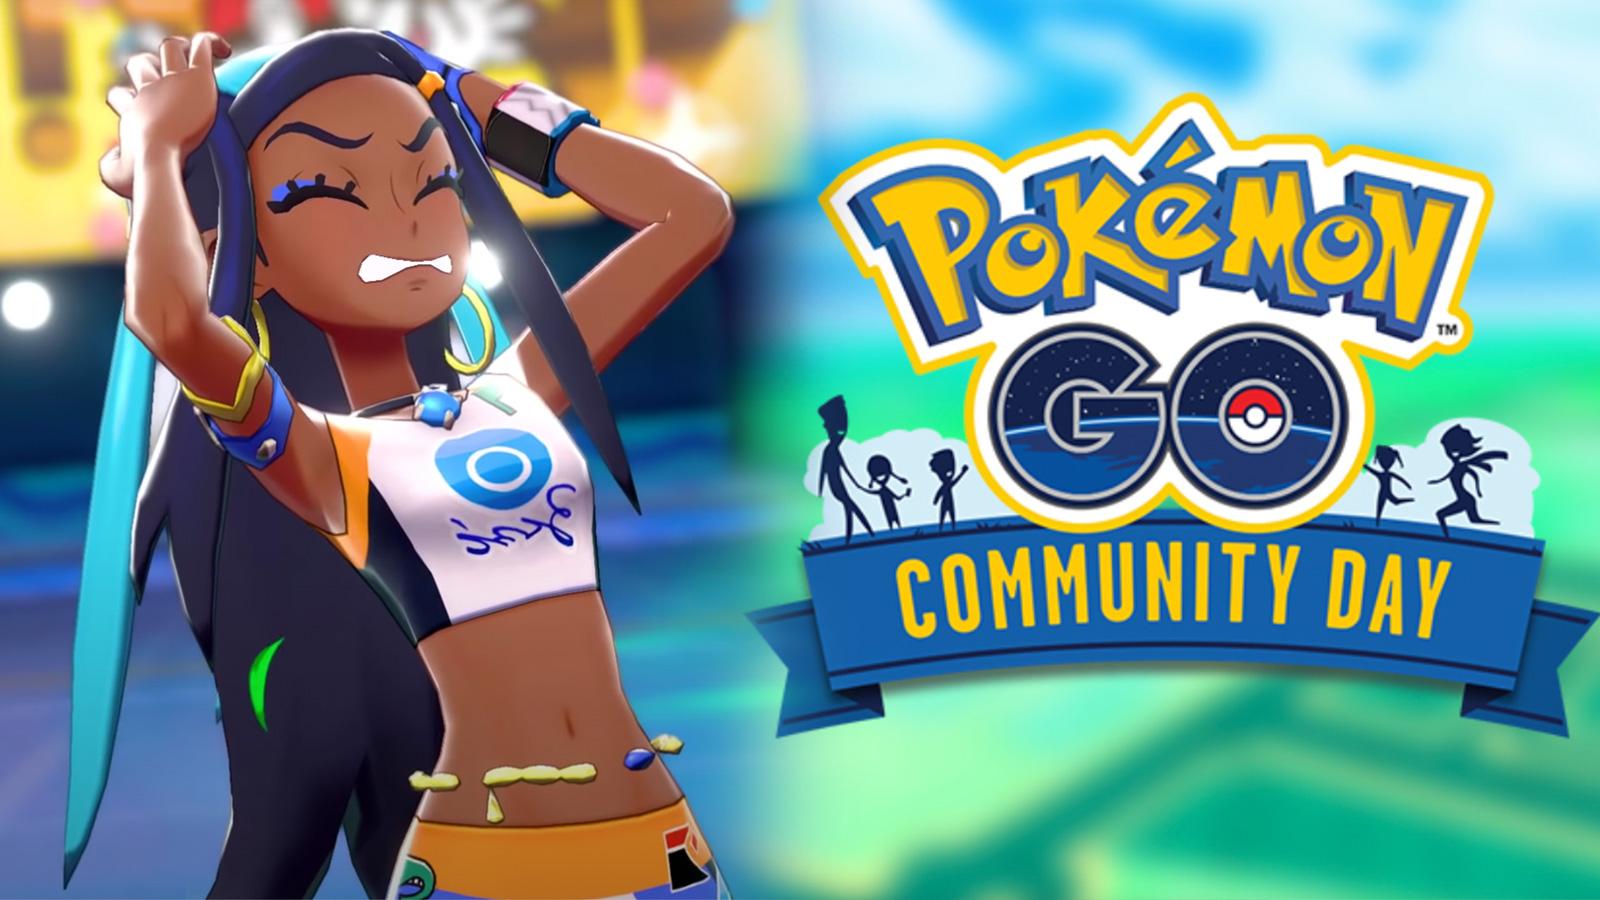 Screenshot of Pokemon Sword & Shield gym leader Nessa angry next to Pokemon Go Community Day logo.